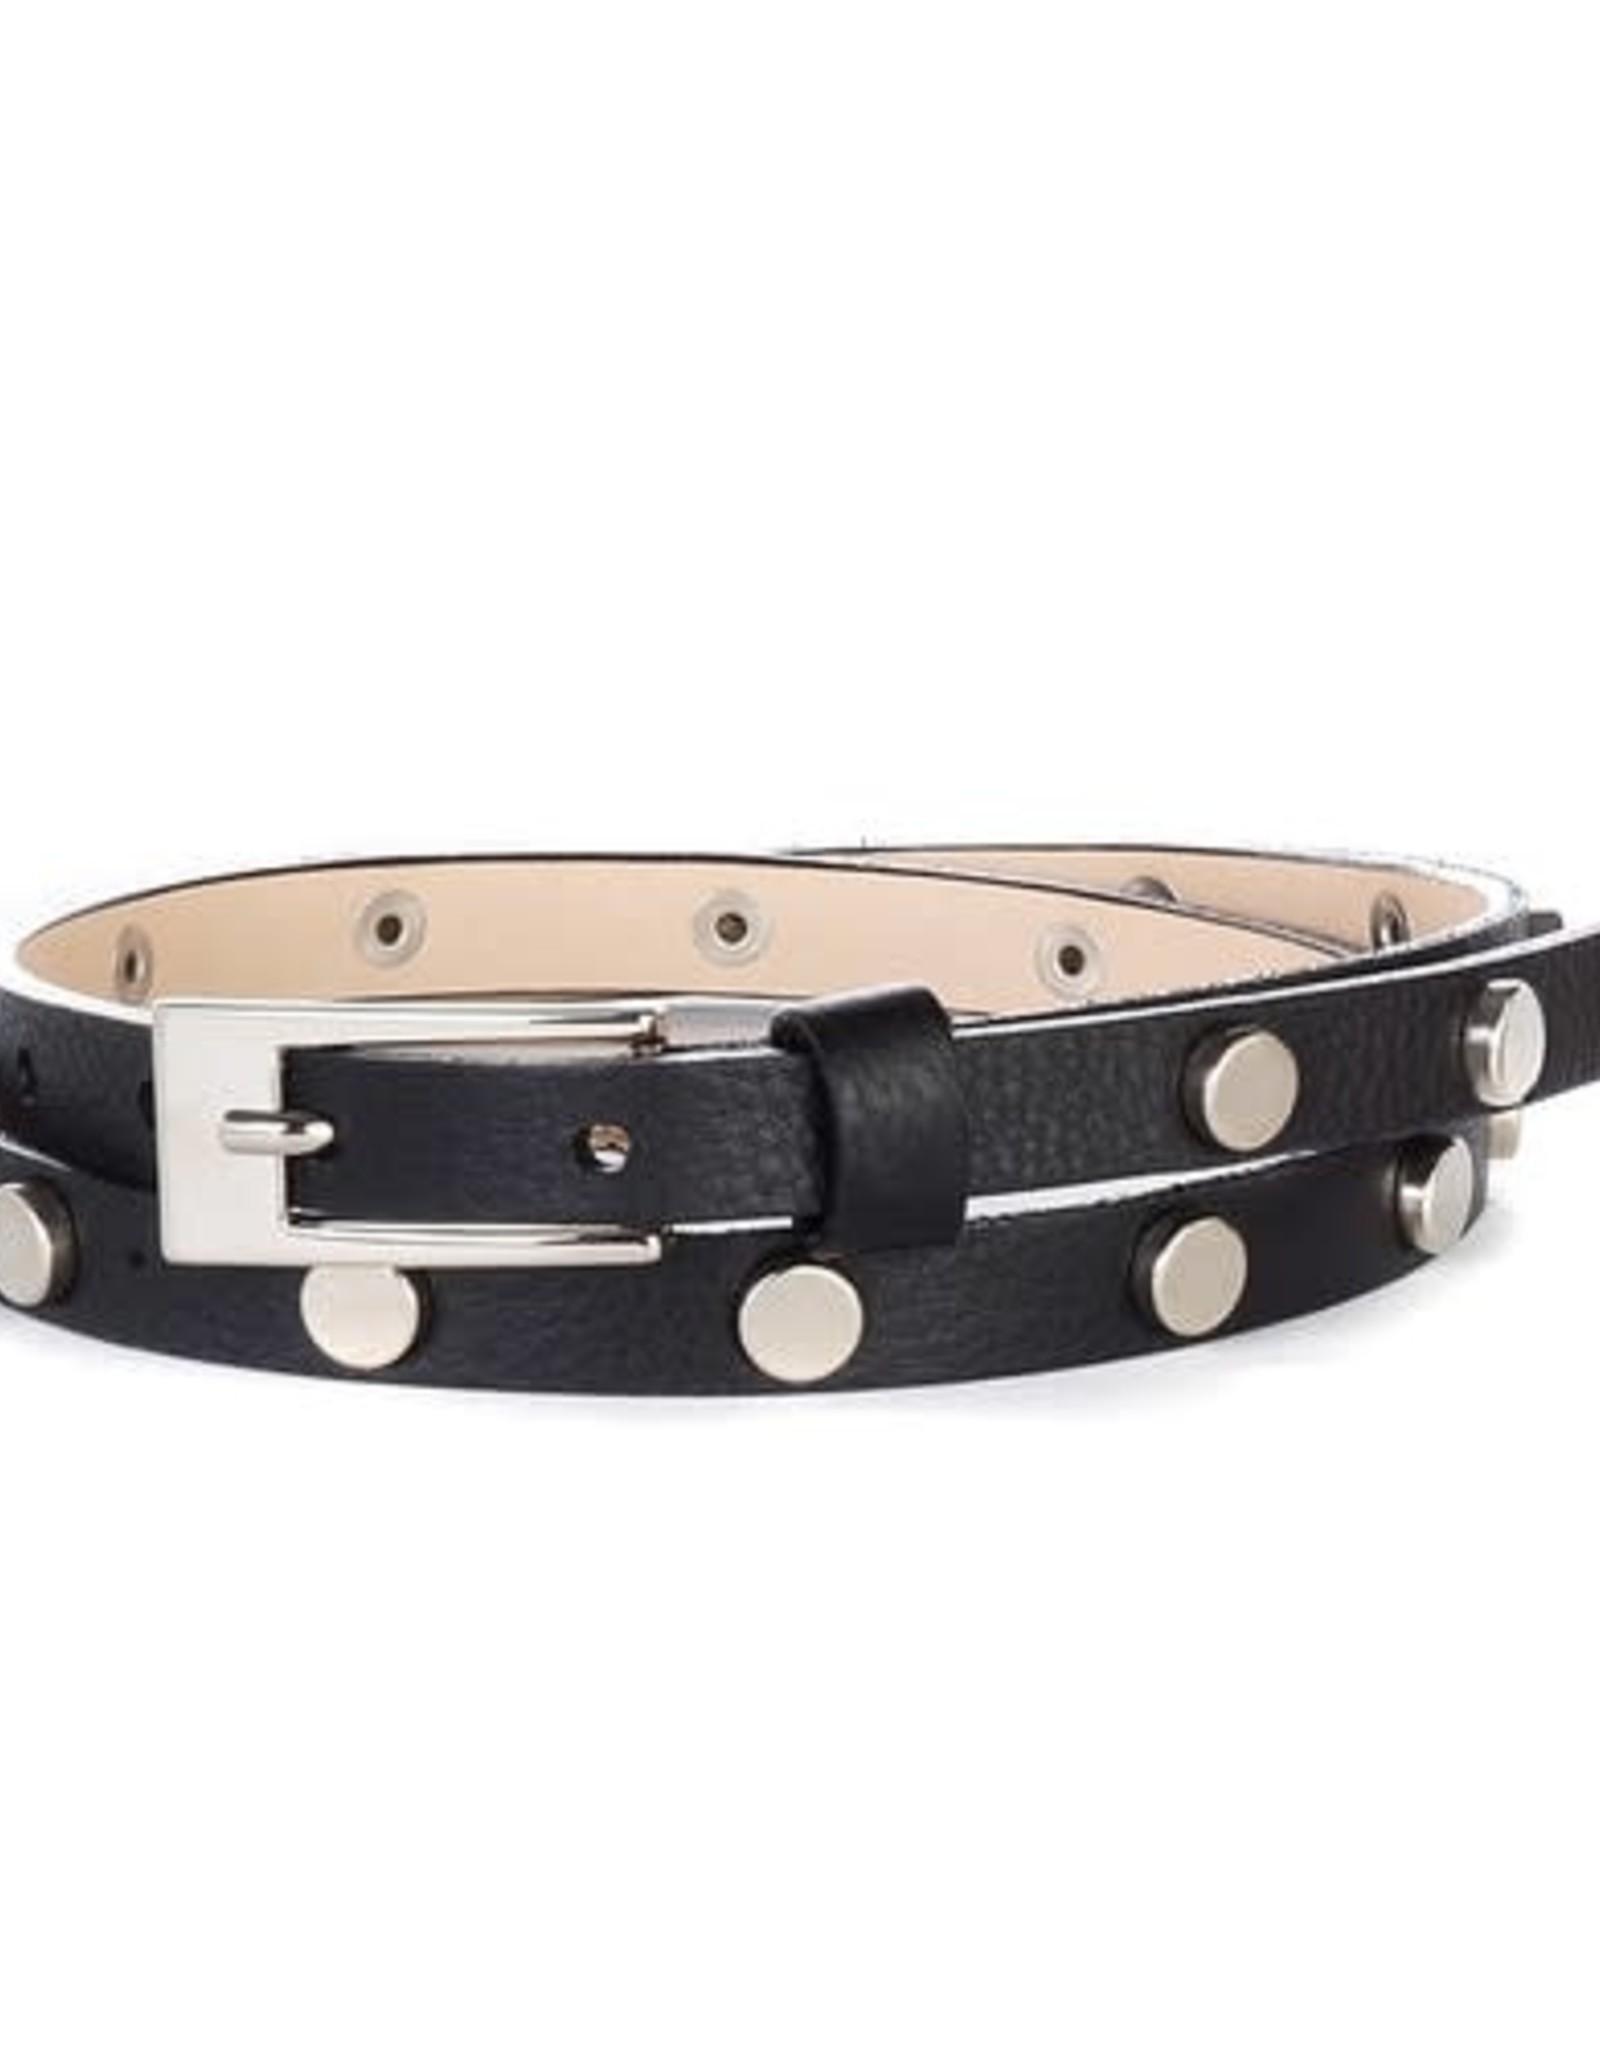 Brave Leather Maja Studded Skinny Belt Black